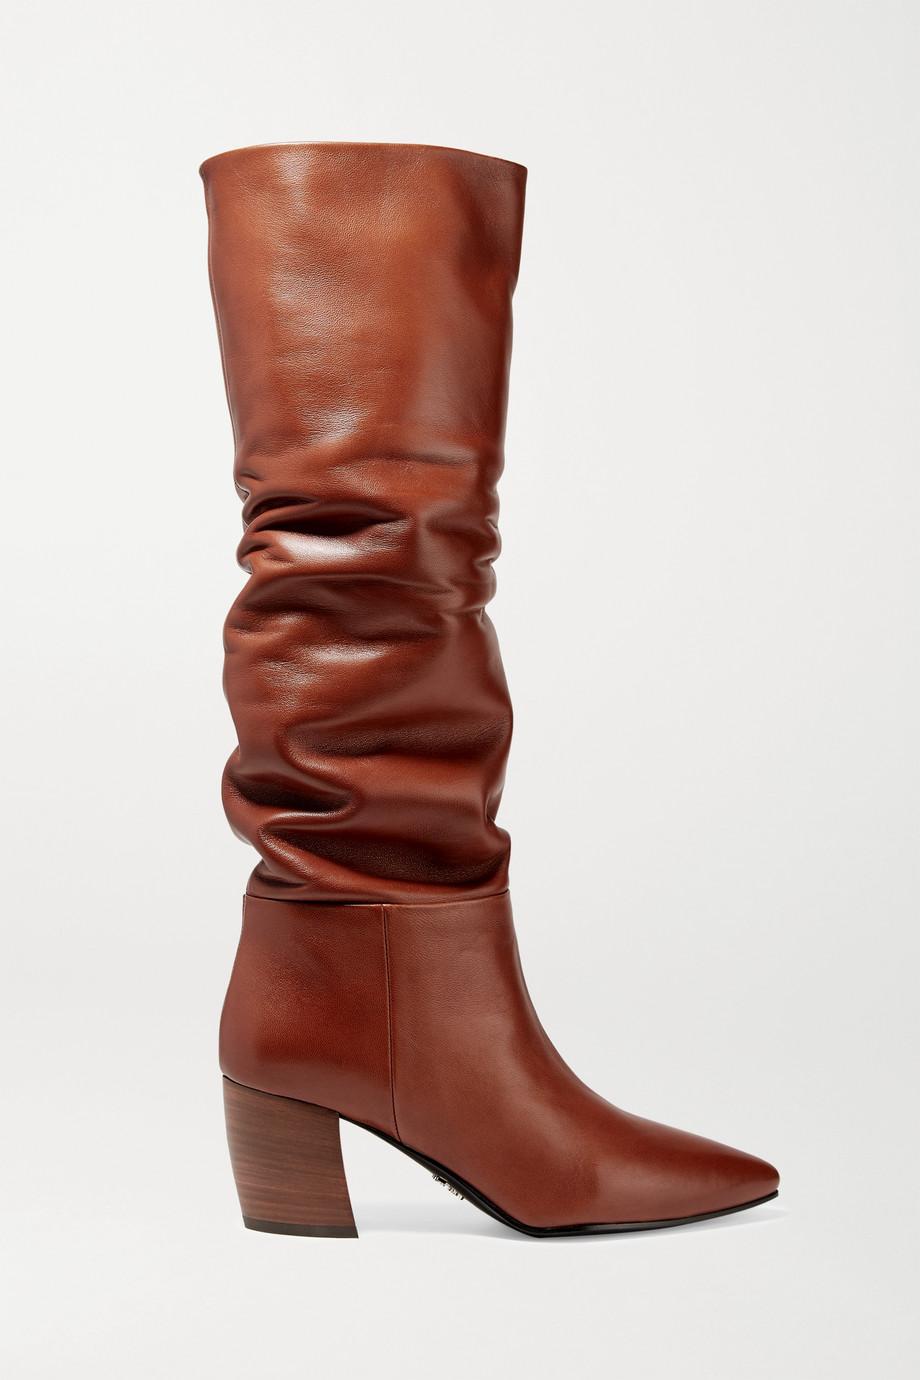 Prada 65 kniehohe Stiefel aus Leder